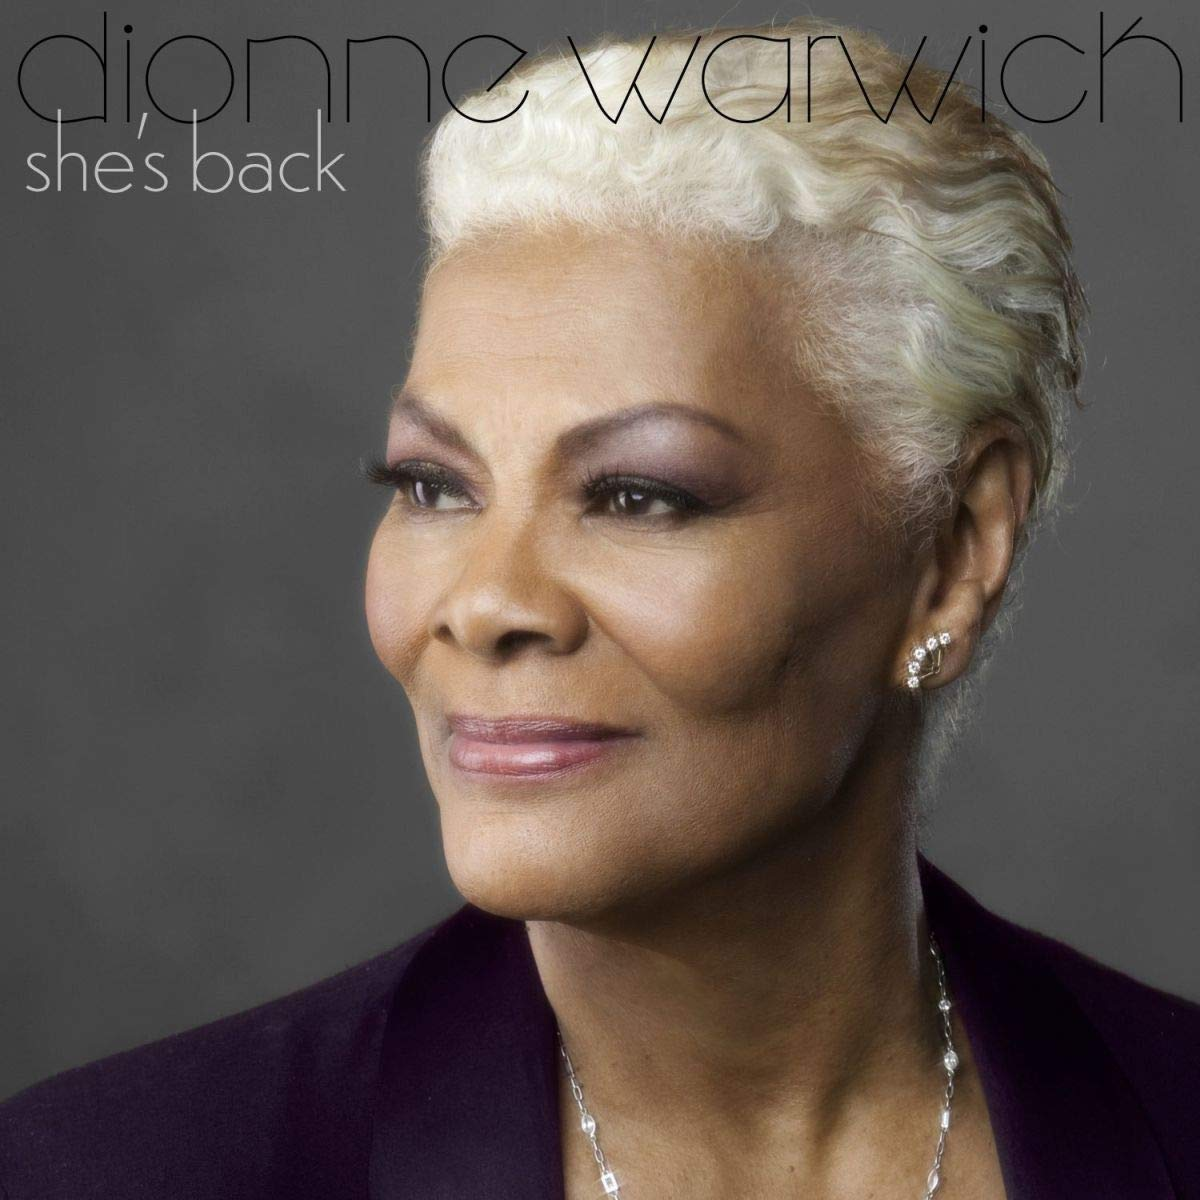 Dionne Warwick She's Back album cover